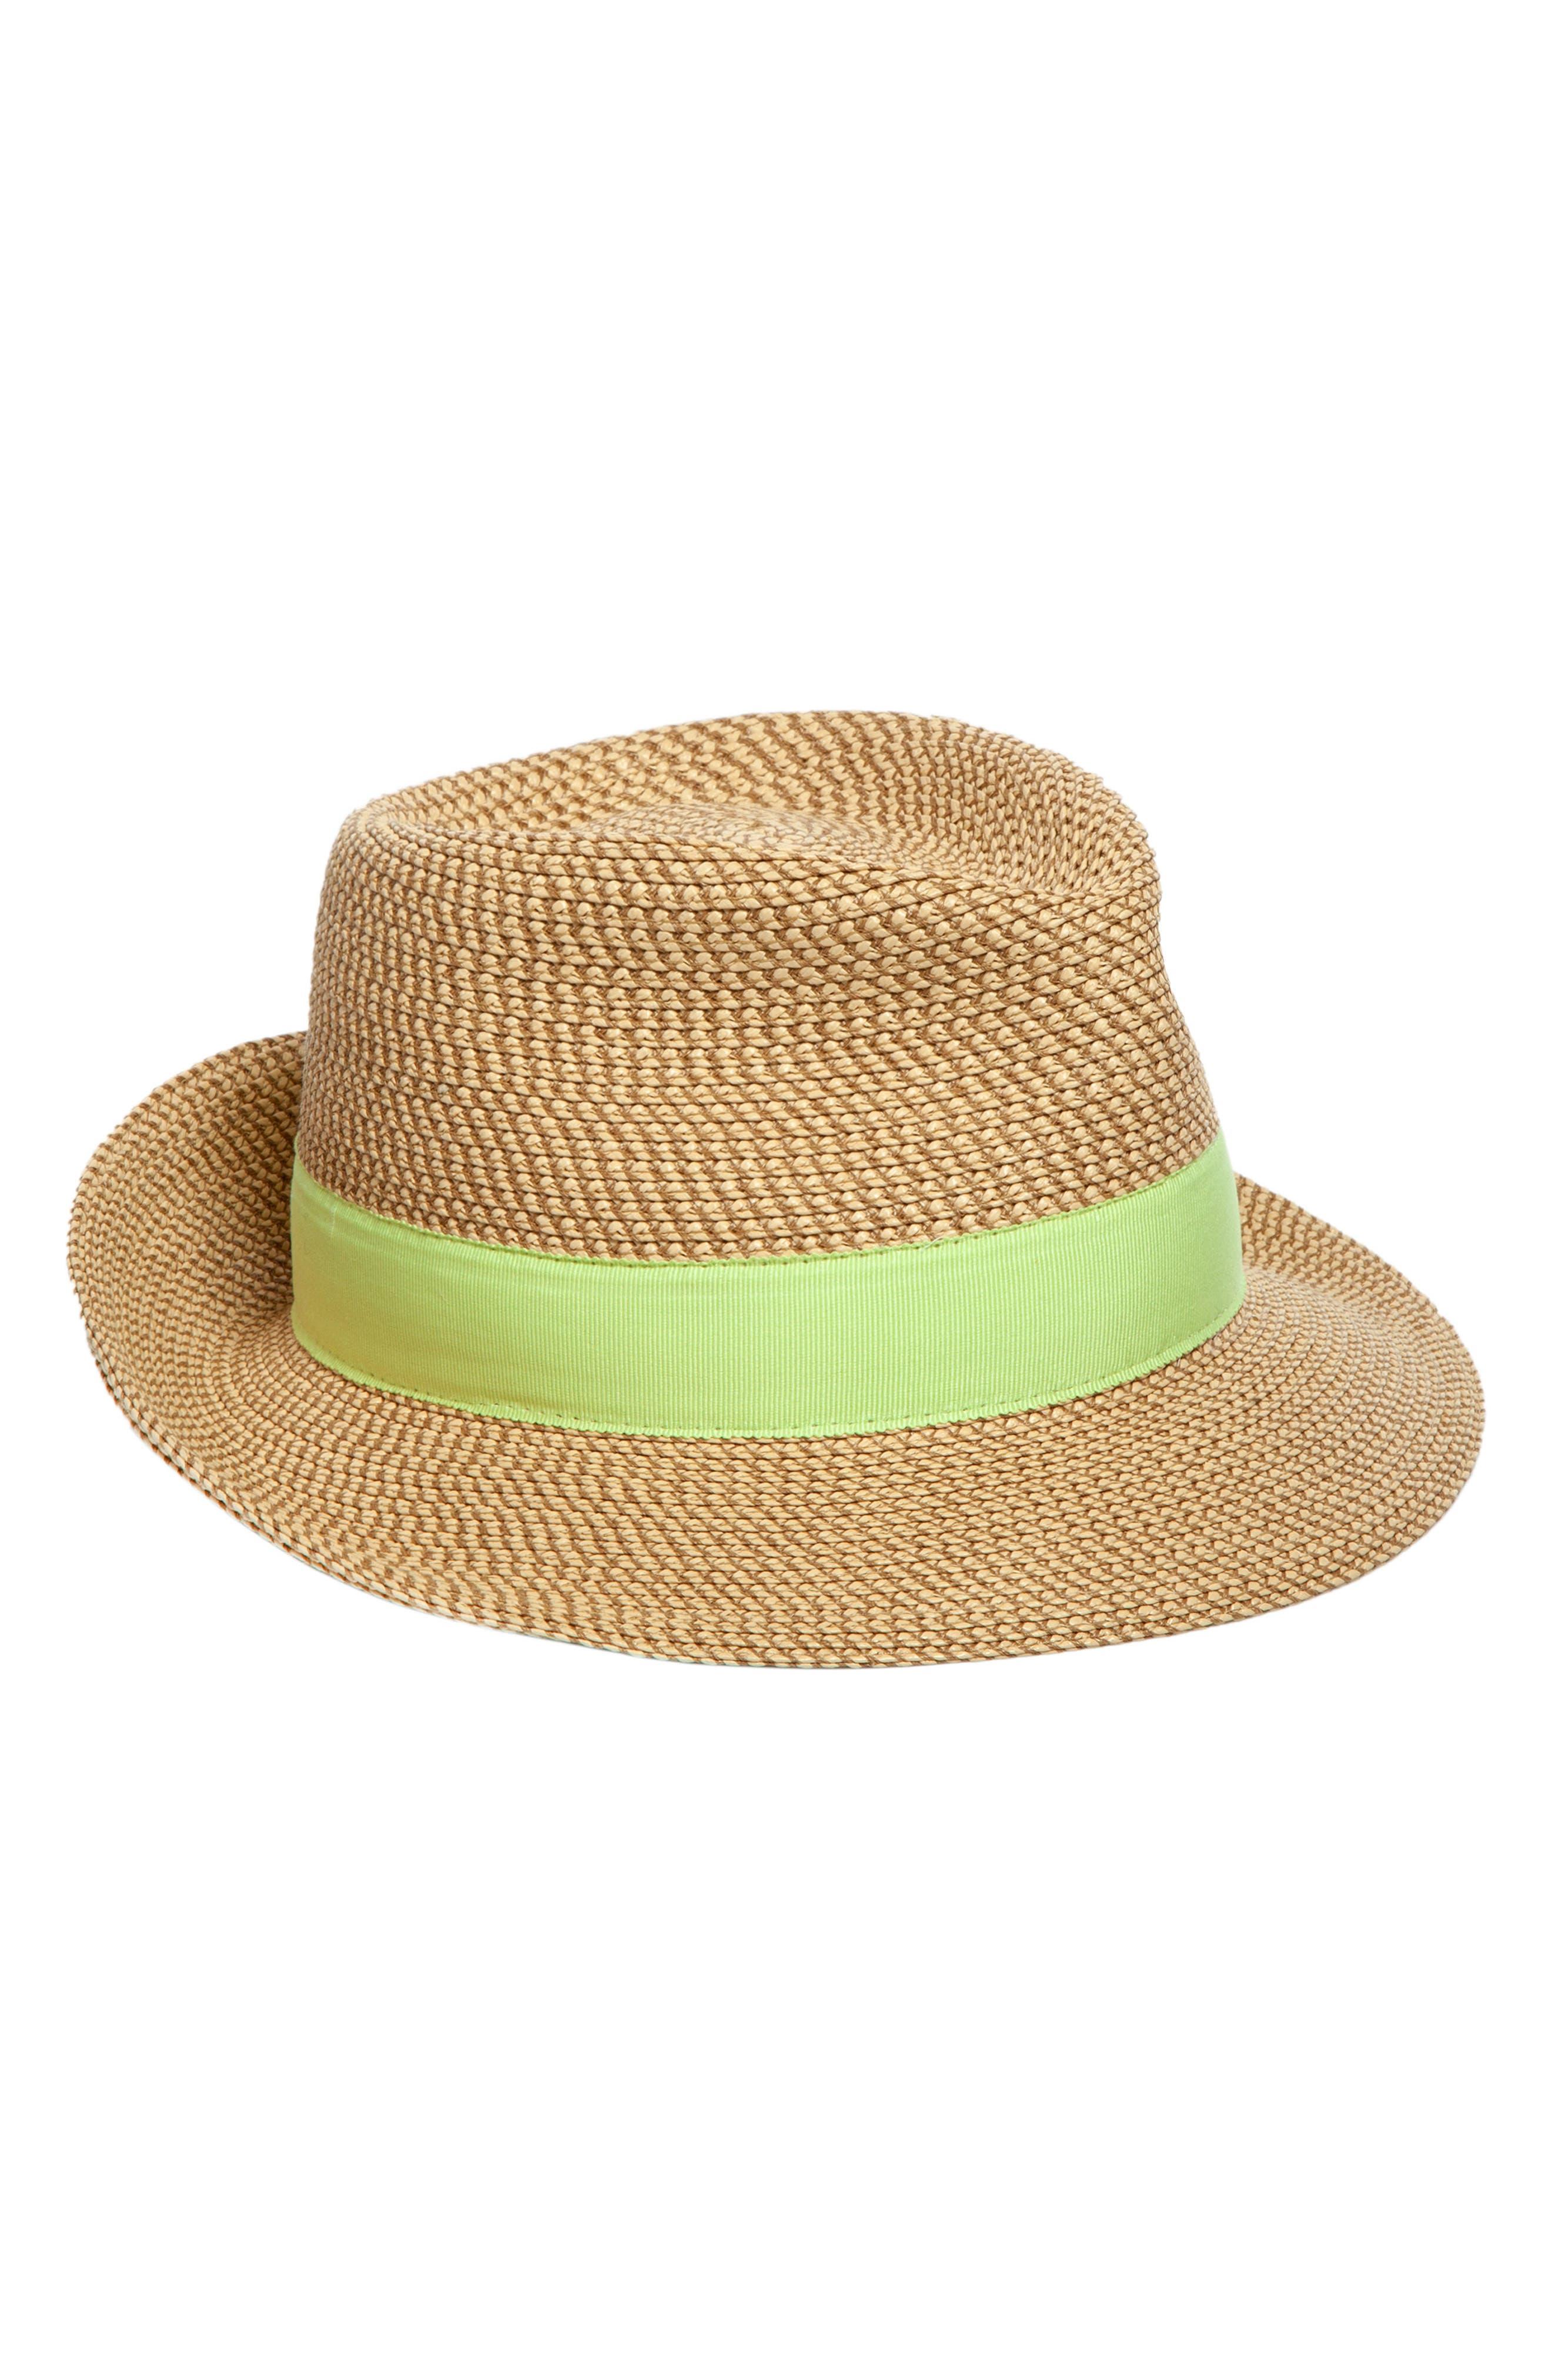 ERIC JAVITS, Classic Squishee<sup>®</sup> Packable Fedora Sun Hat, Main thumbnail 1, color, PEANUT/ CITRON